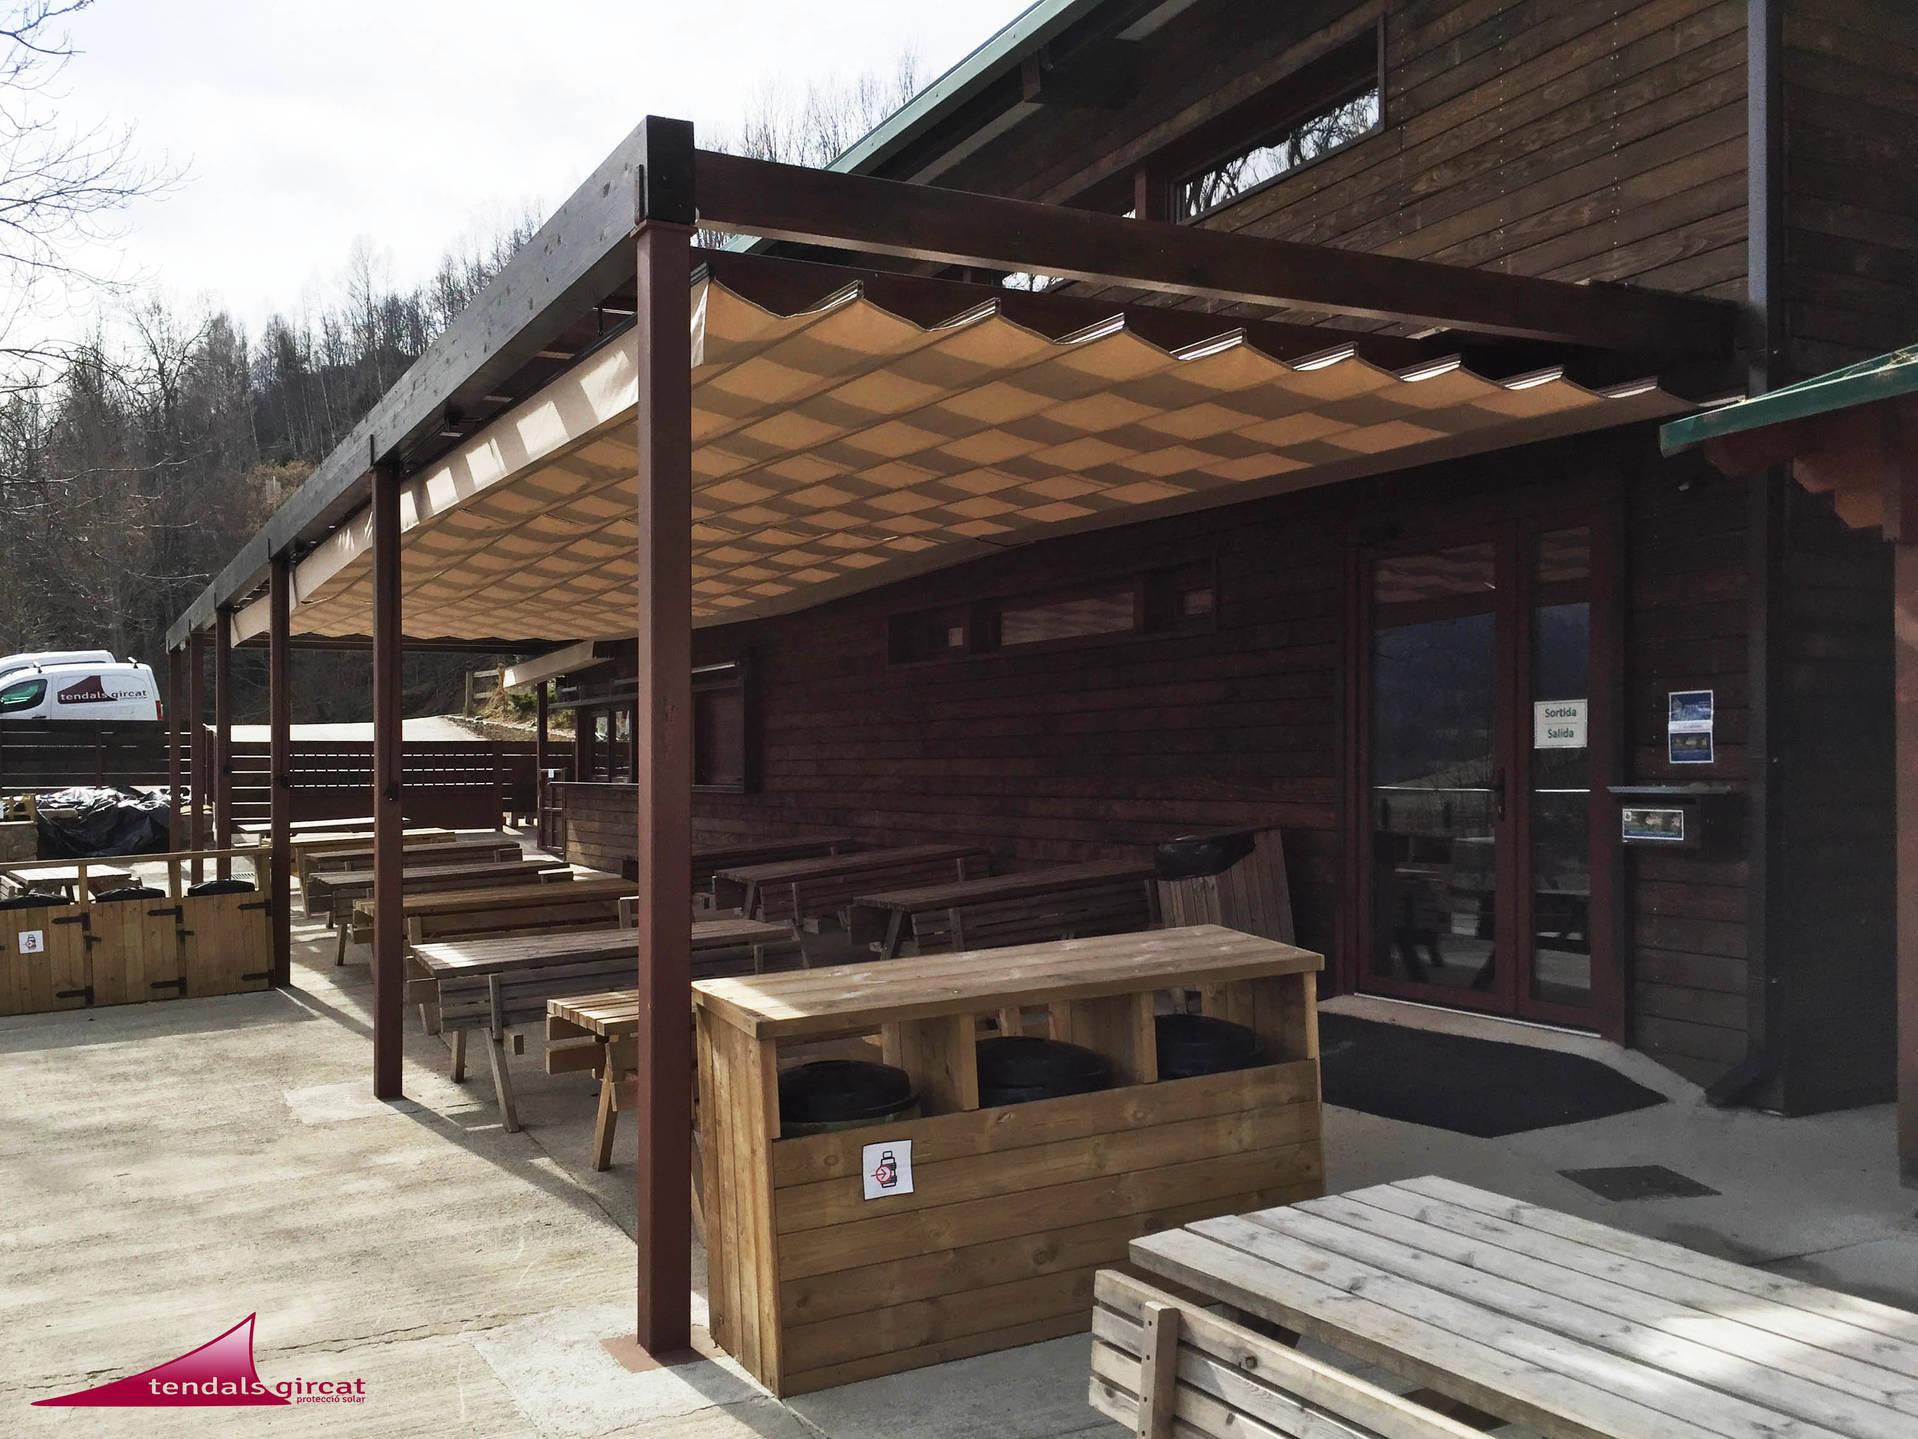 P rgola de madera con toldos correderos - Toldos para pergolas de madera ...